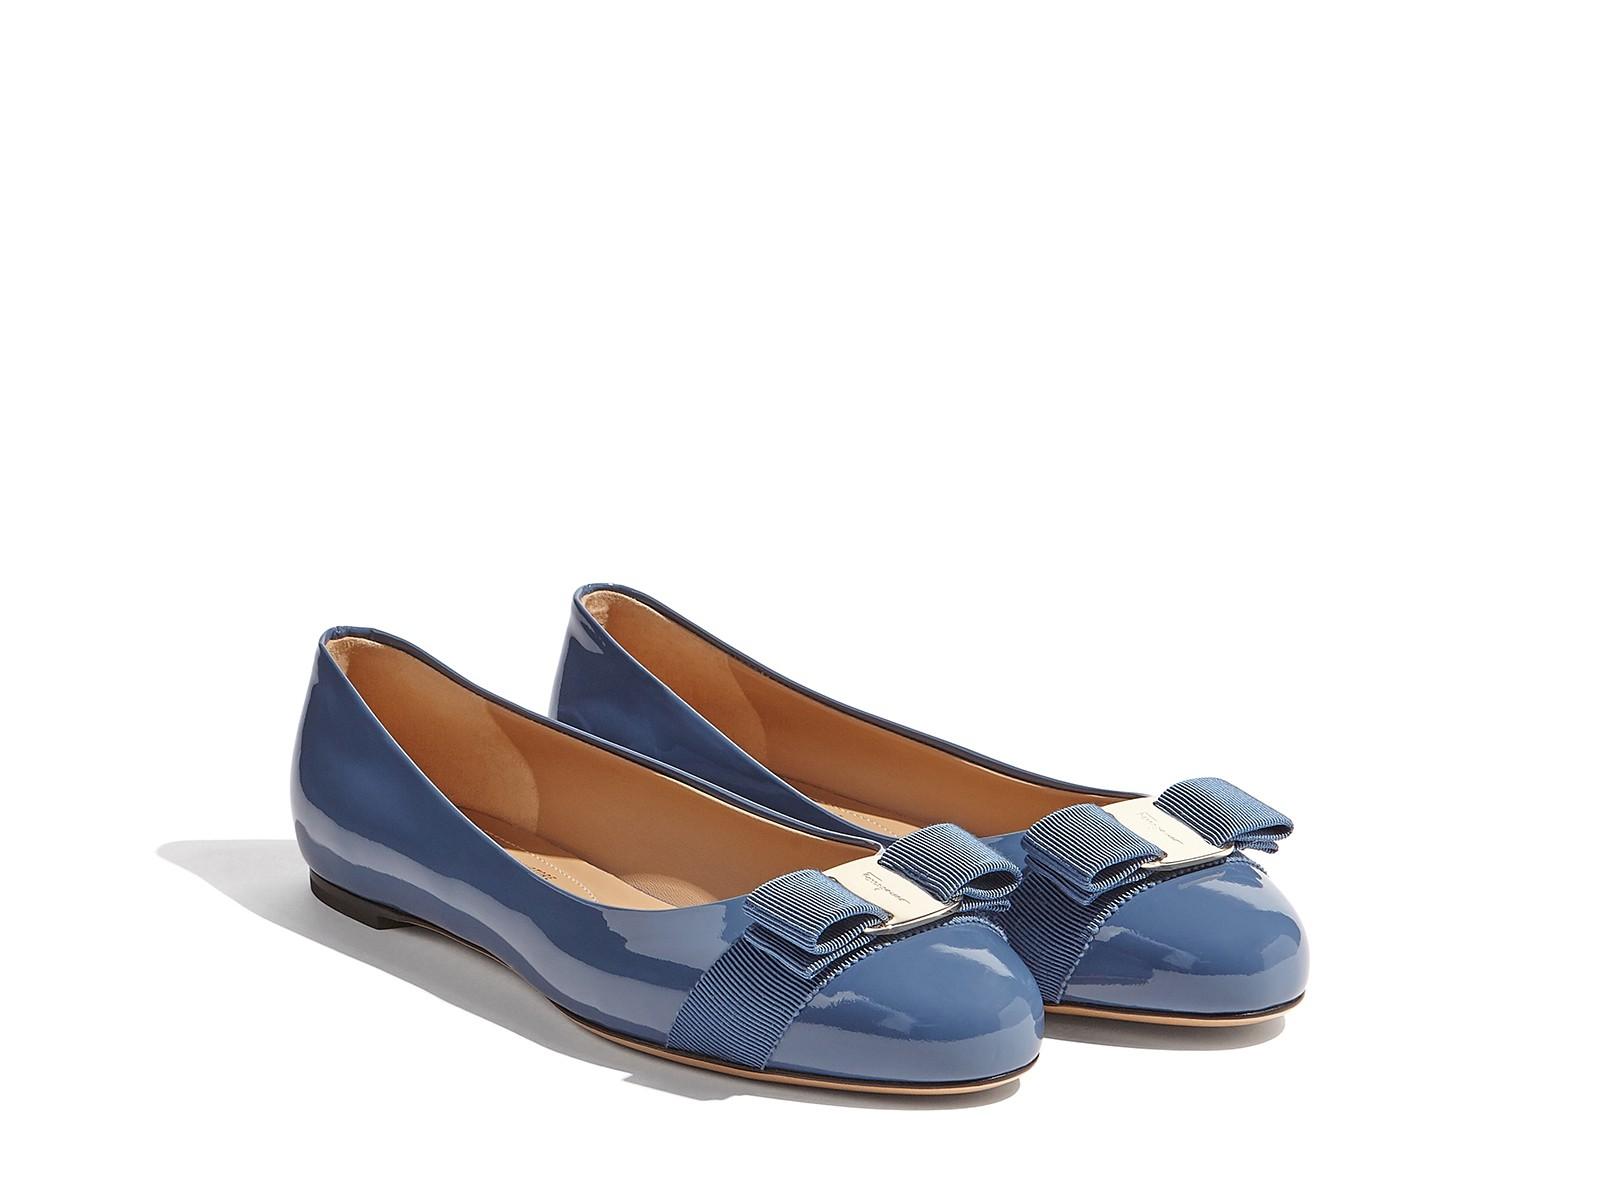 7a197aecd53a Salvatore Ferragamo Varina Ballet Flat In Blue Stone